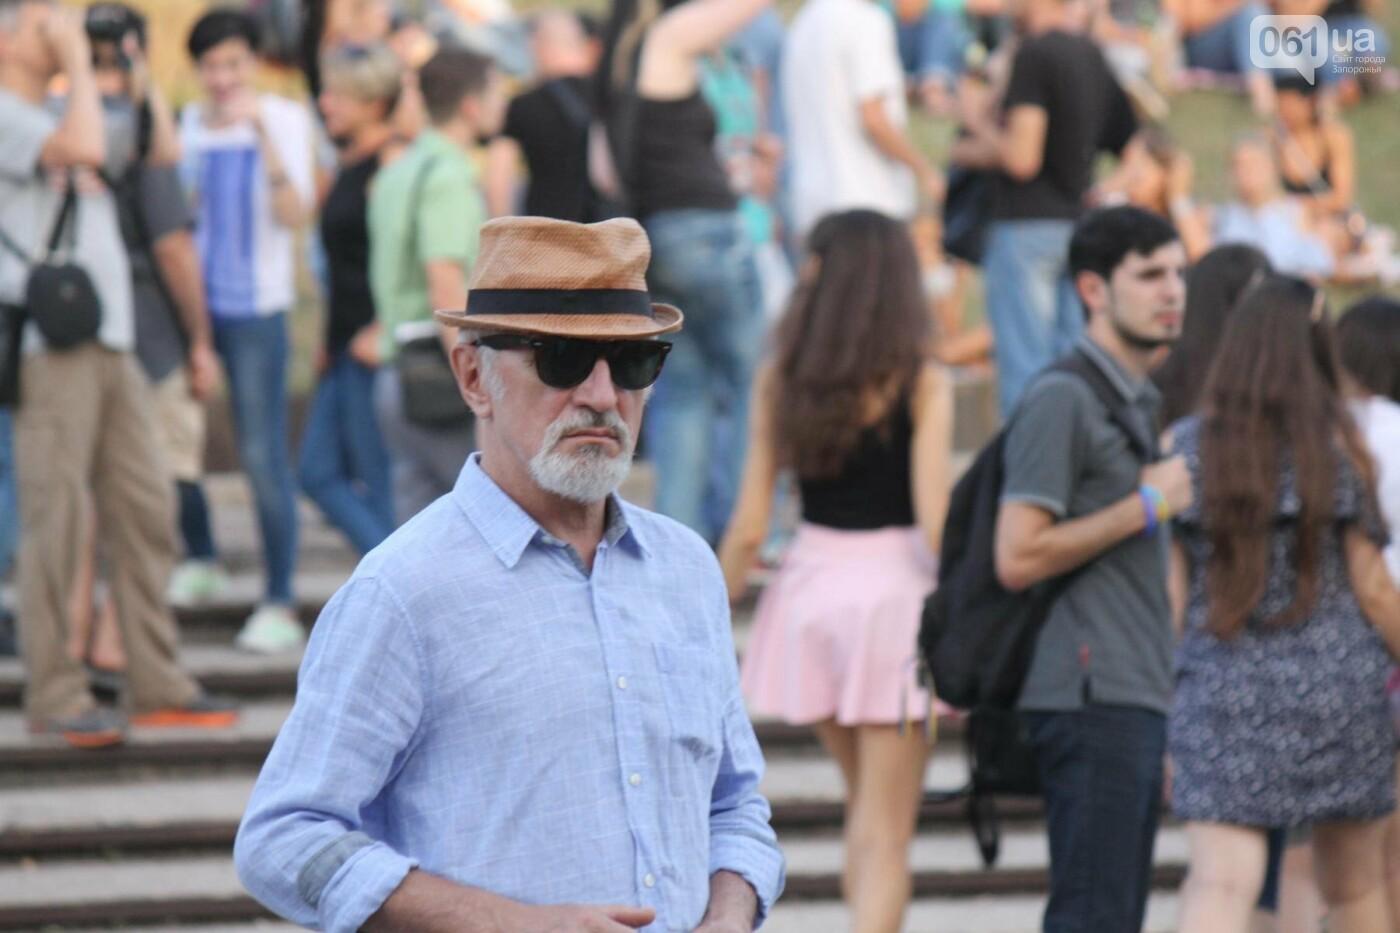 Найди себя: 50 портретов посетителей фестиваля Khortytsia Freedom, – ФОТОРЕПОРТАЖ, фото-18